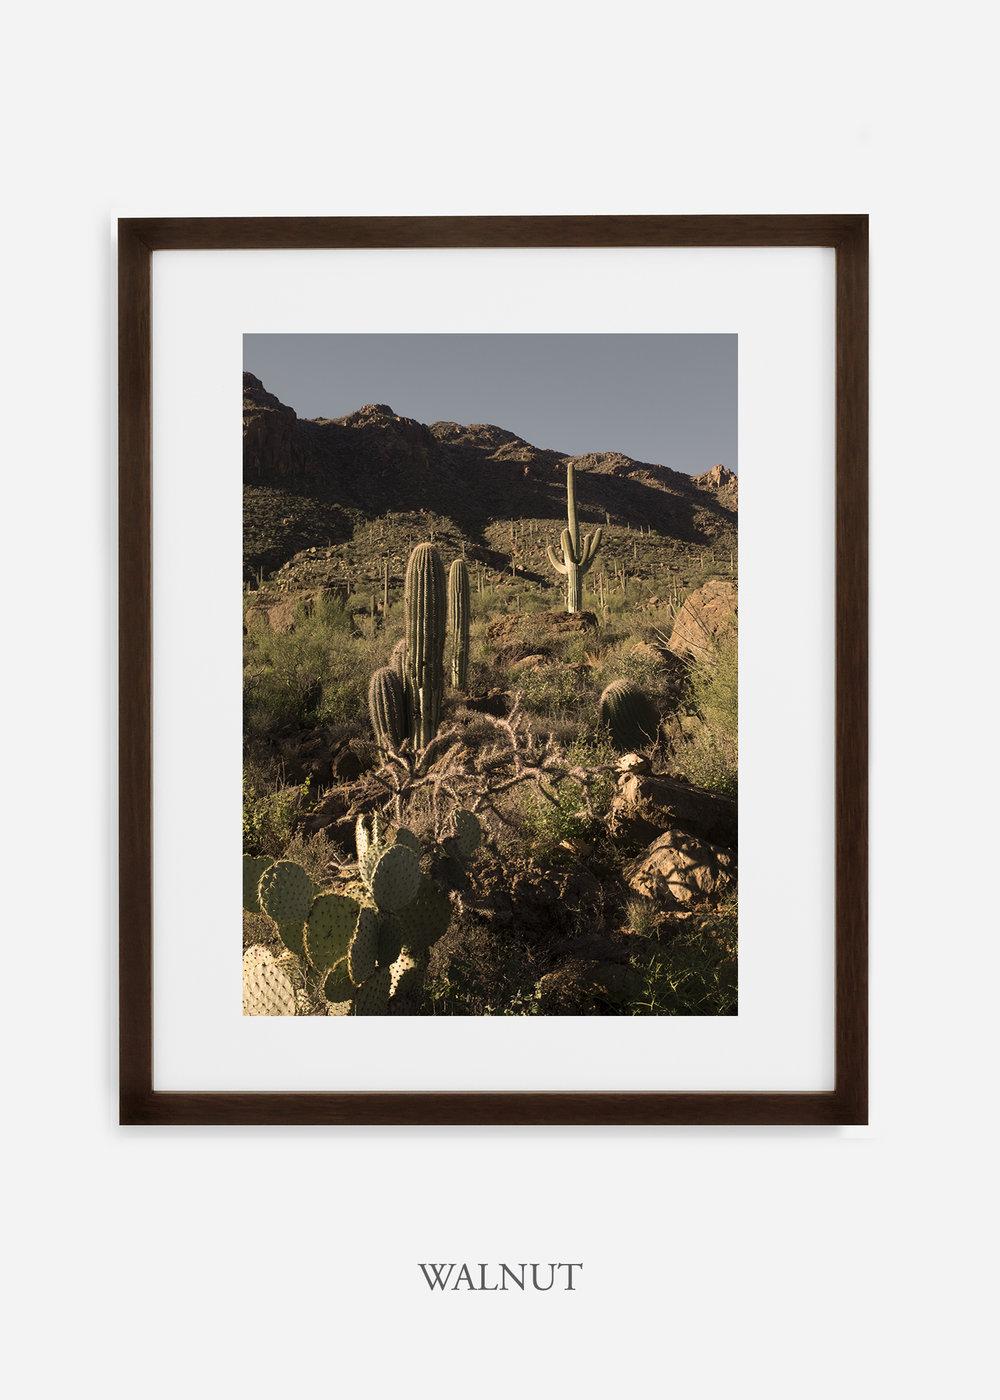 walnutframe-saguaroNo.18-wildercalifornia-art-wallart-cactusprint-homedecor-prints-arizona-botanical-artwork-interiordesign.jpg